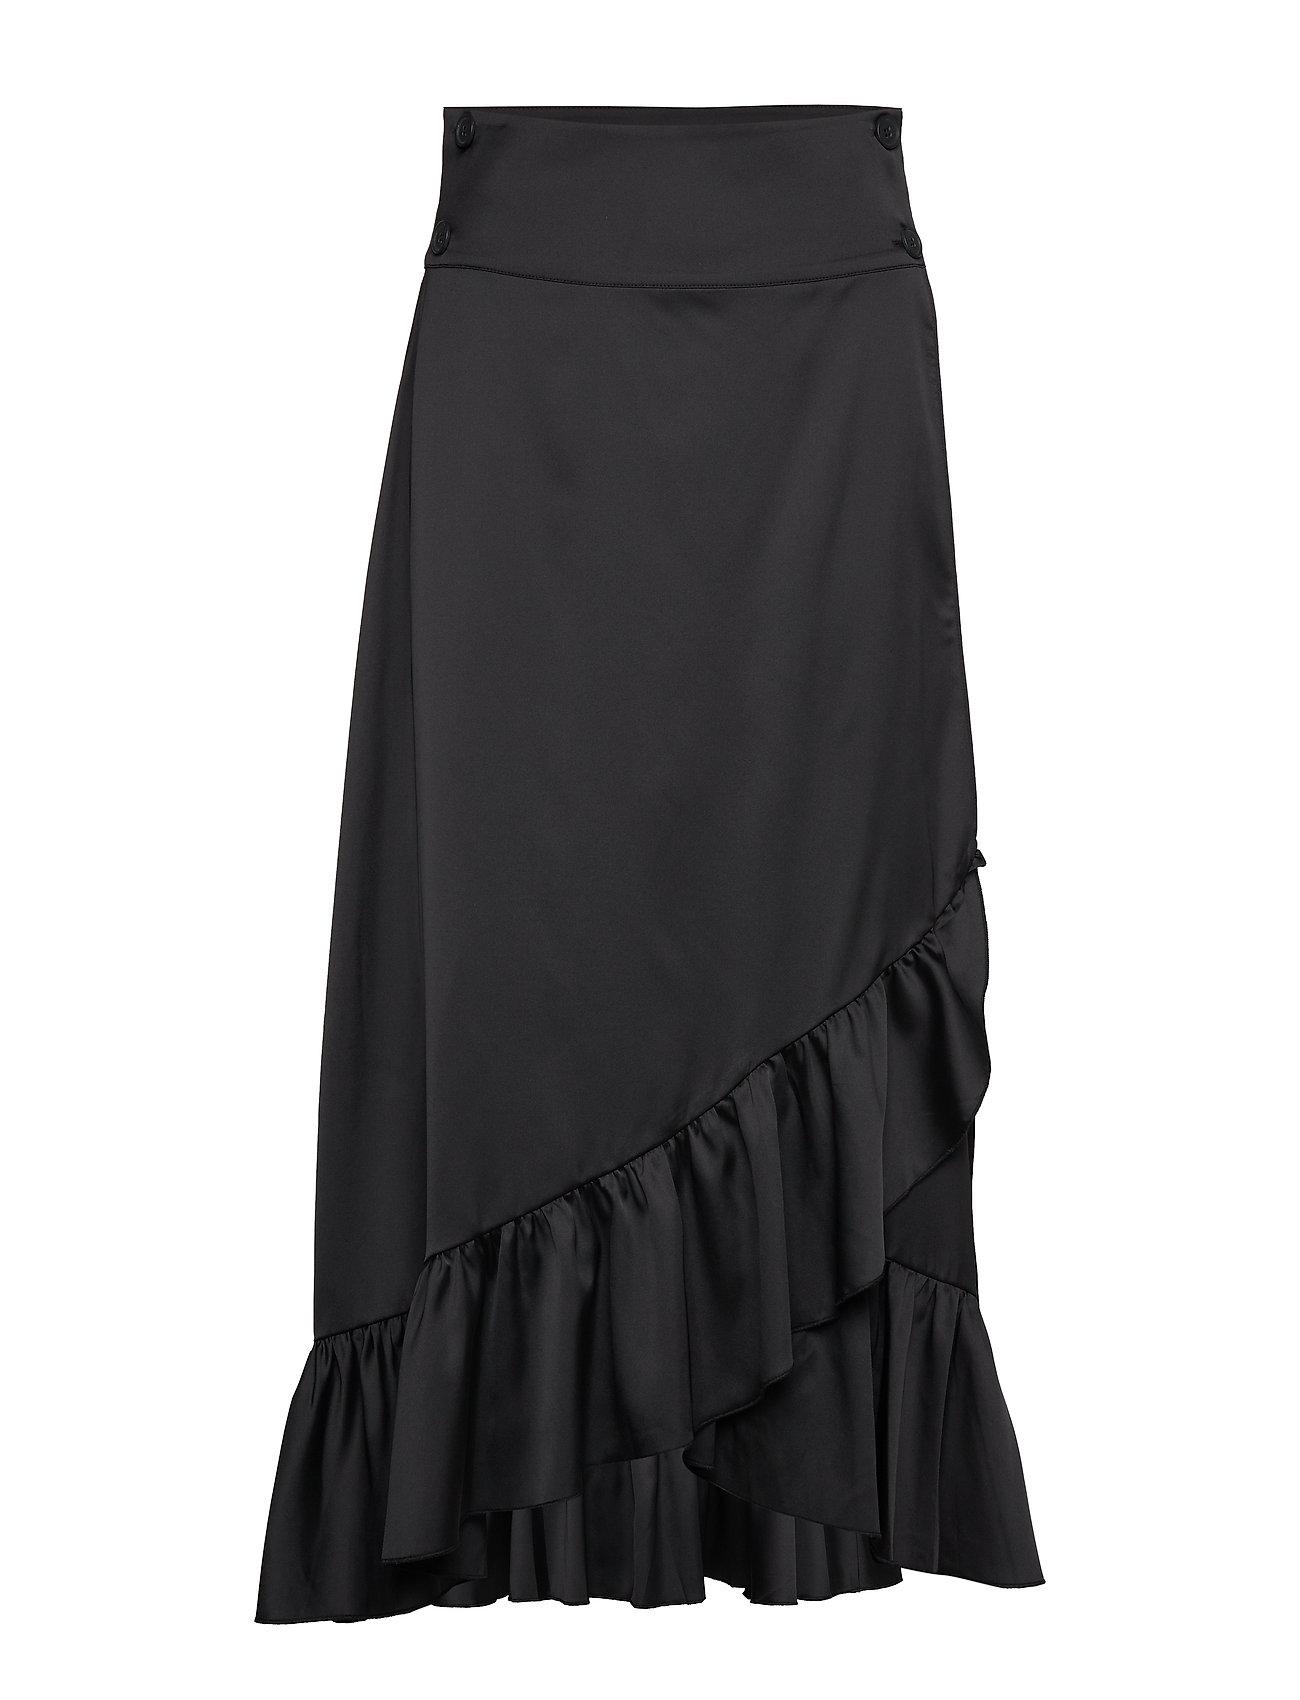 Twist & Tango Tammy Long Skirt - BLACK